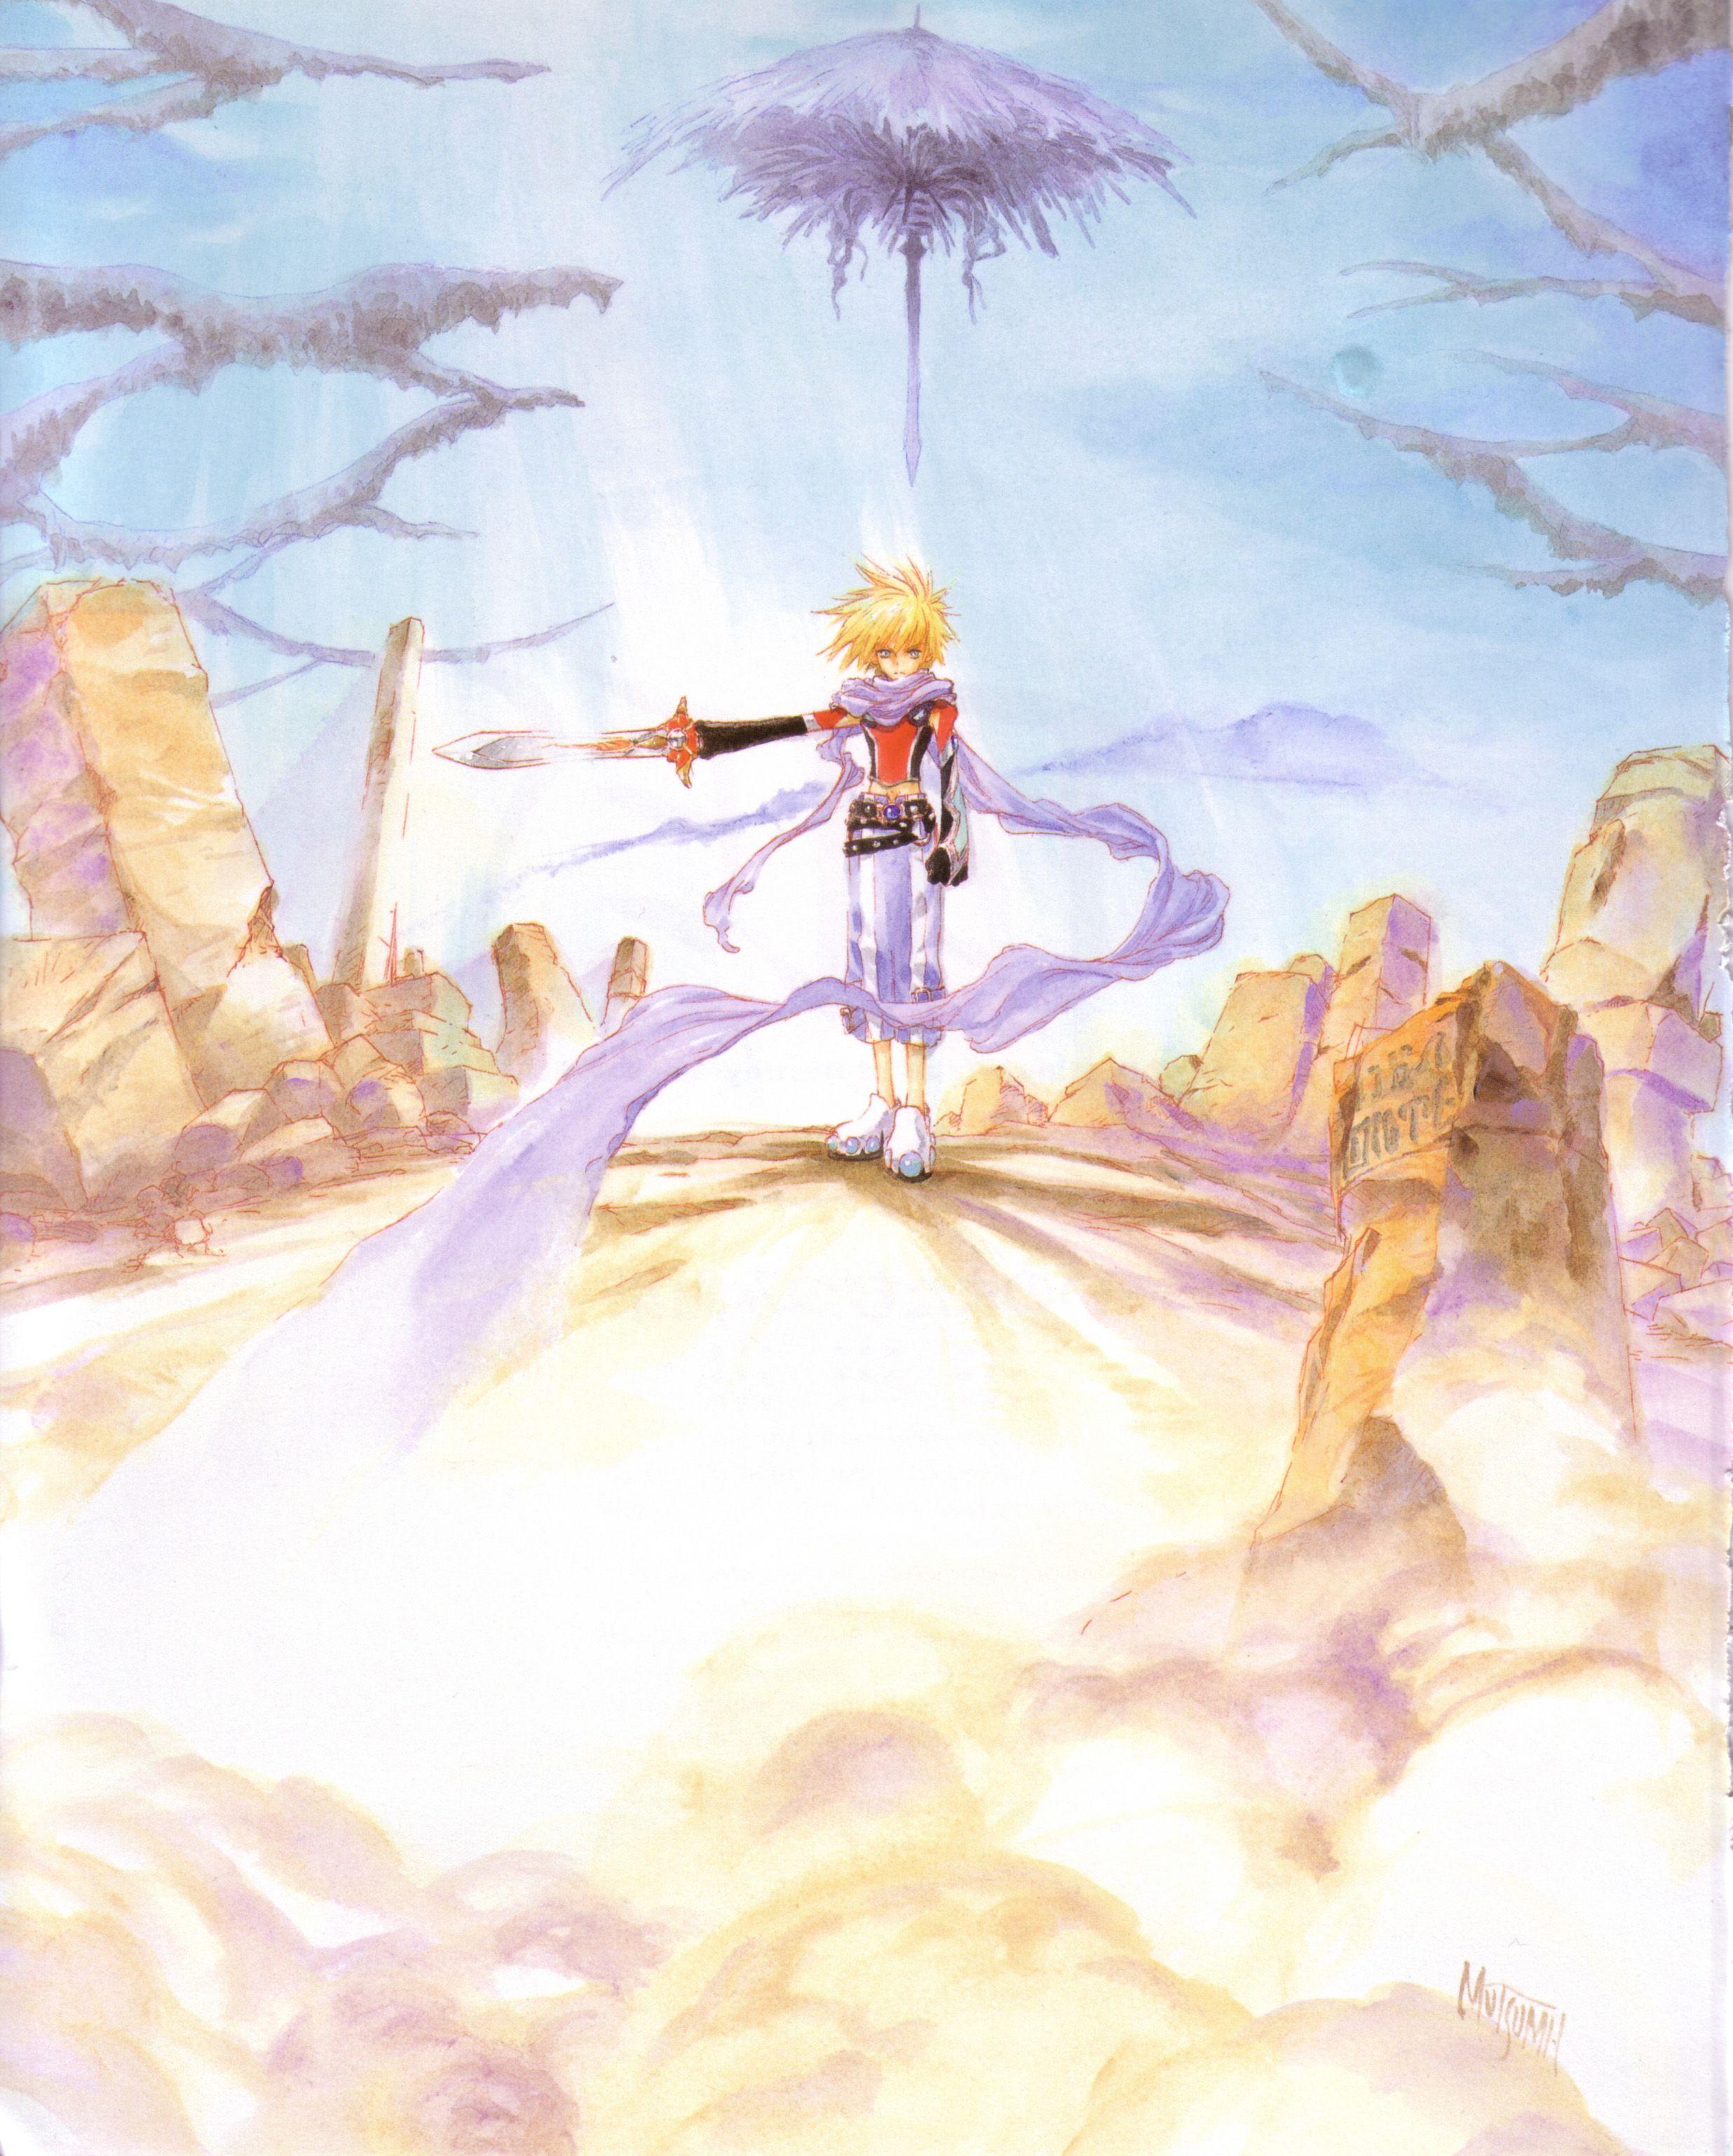 Kyle Dunamis from Tales of Destiny 2 illustration by Mutsumi Inomata